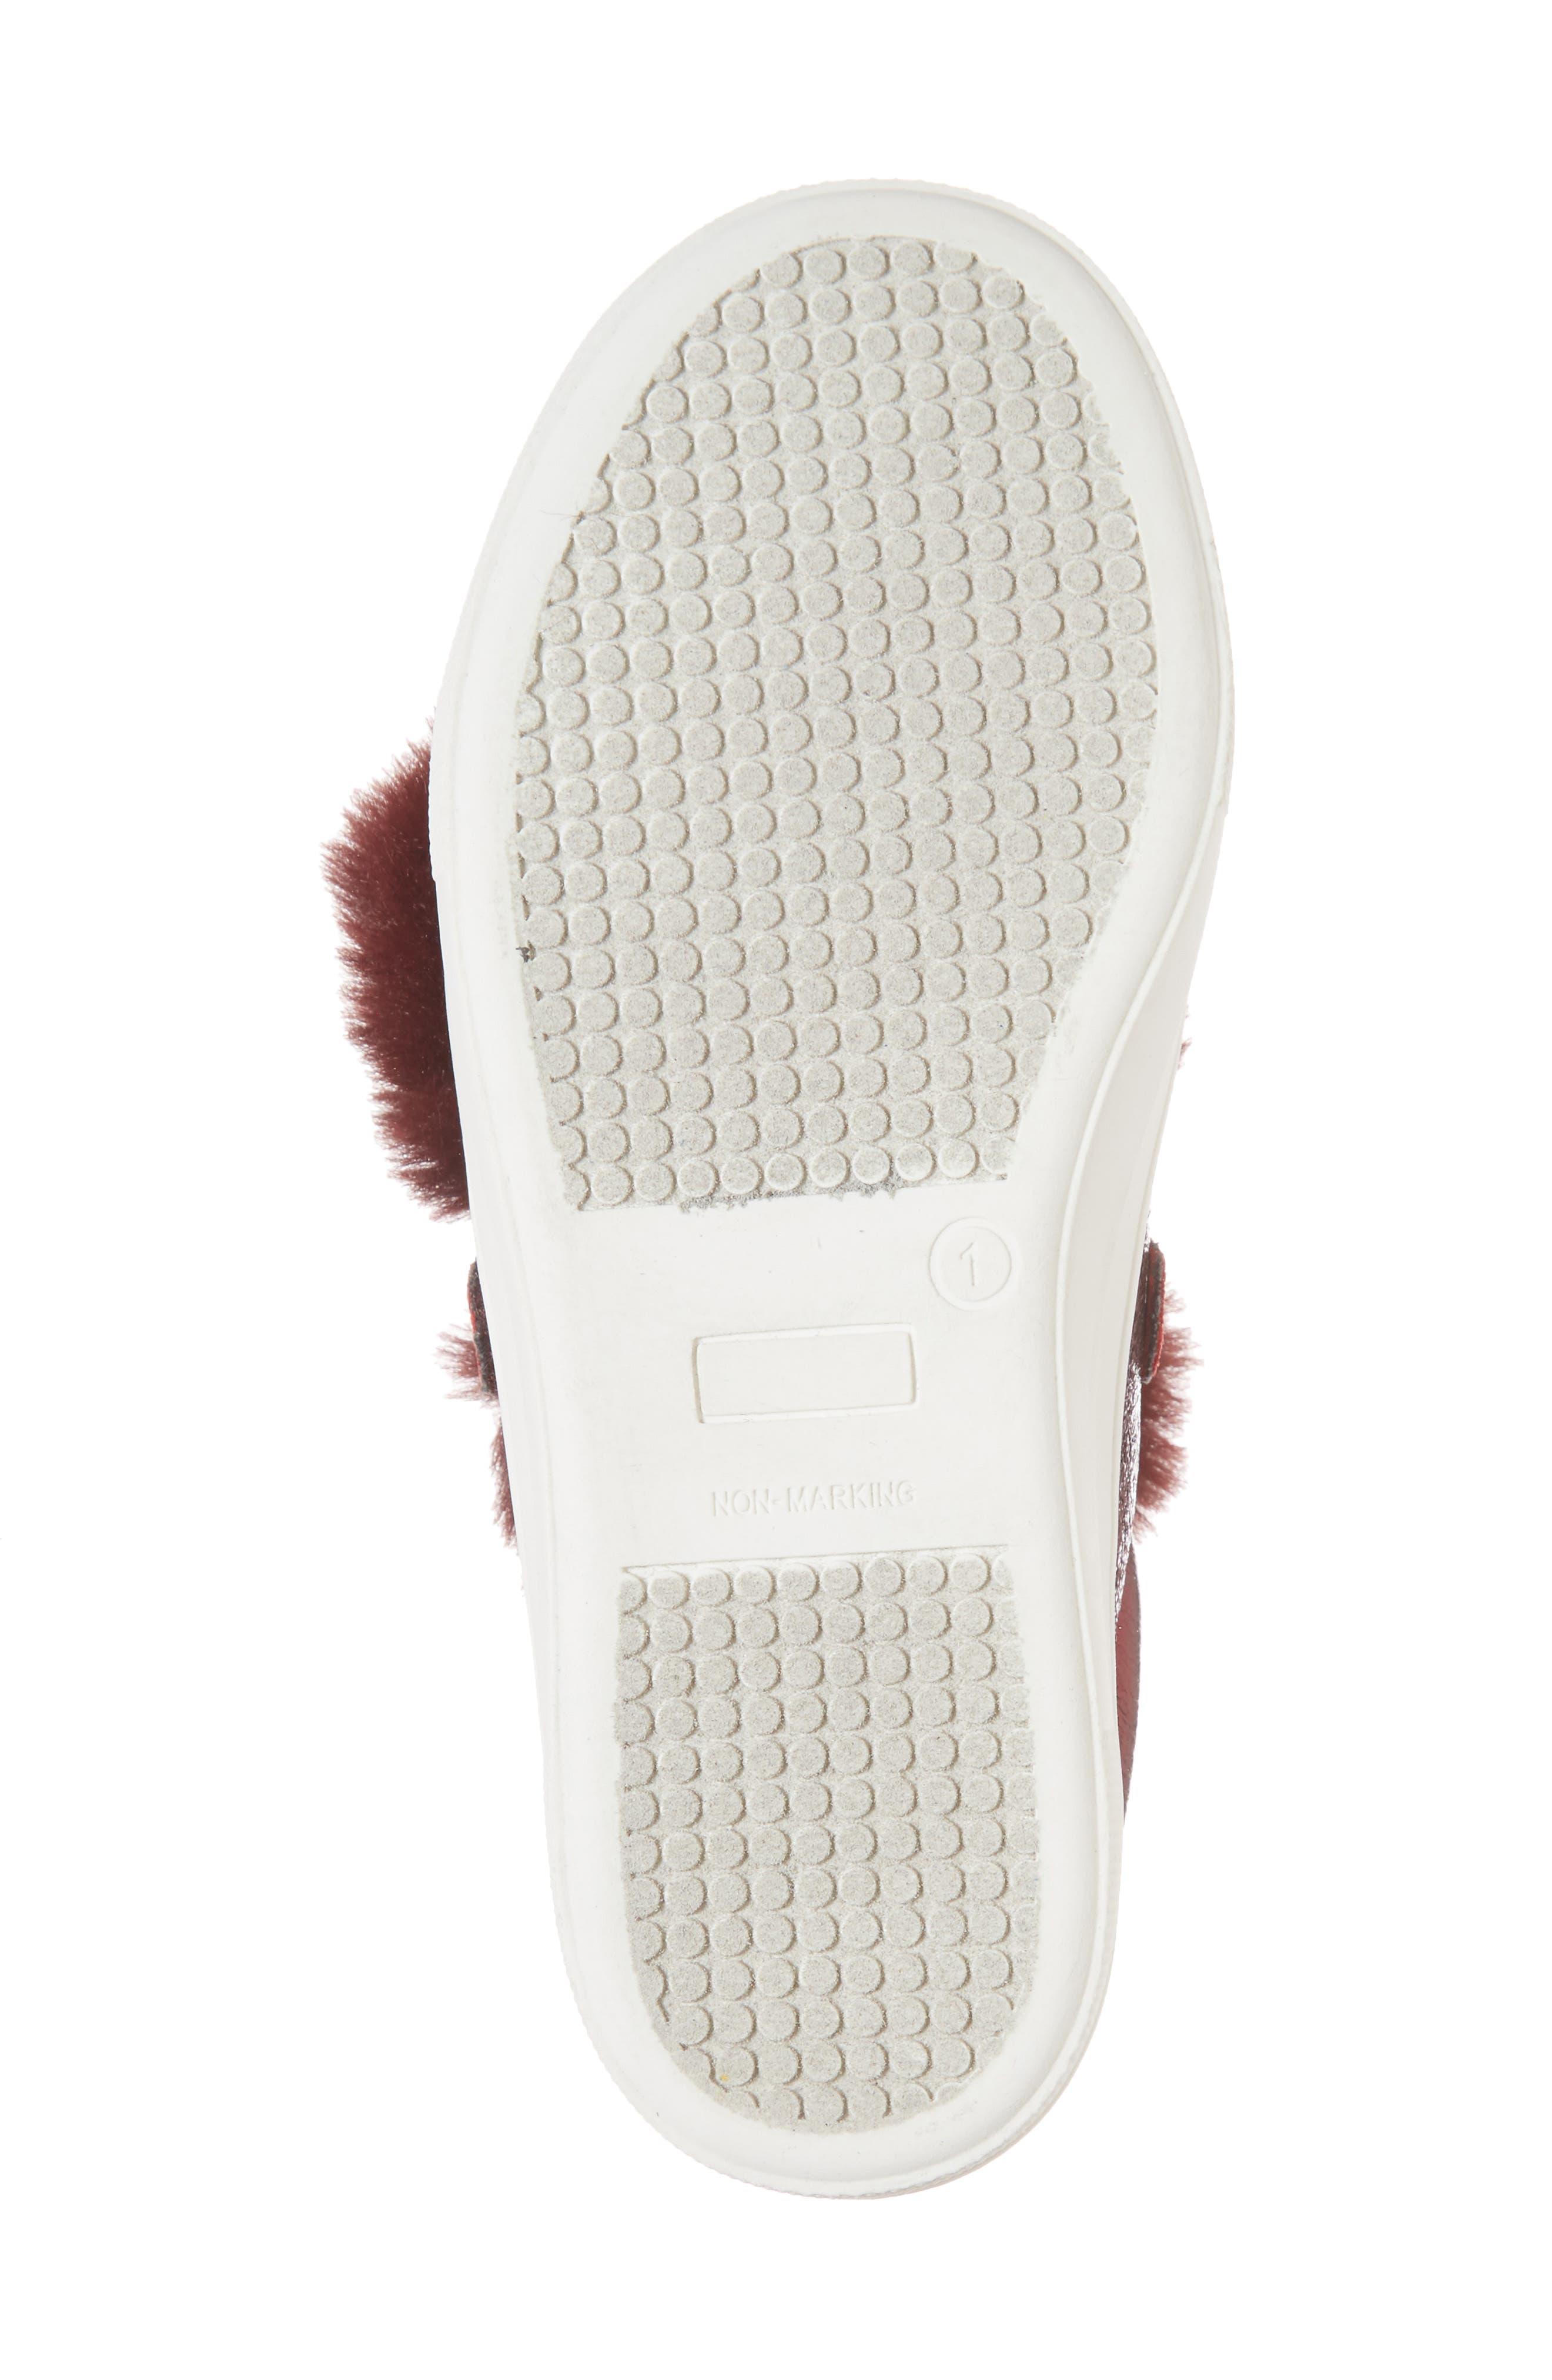 Zandra Faux Fur Metallic Sneaker,                             Alternate thumbnail 6, color,                             930